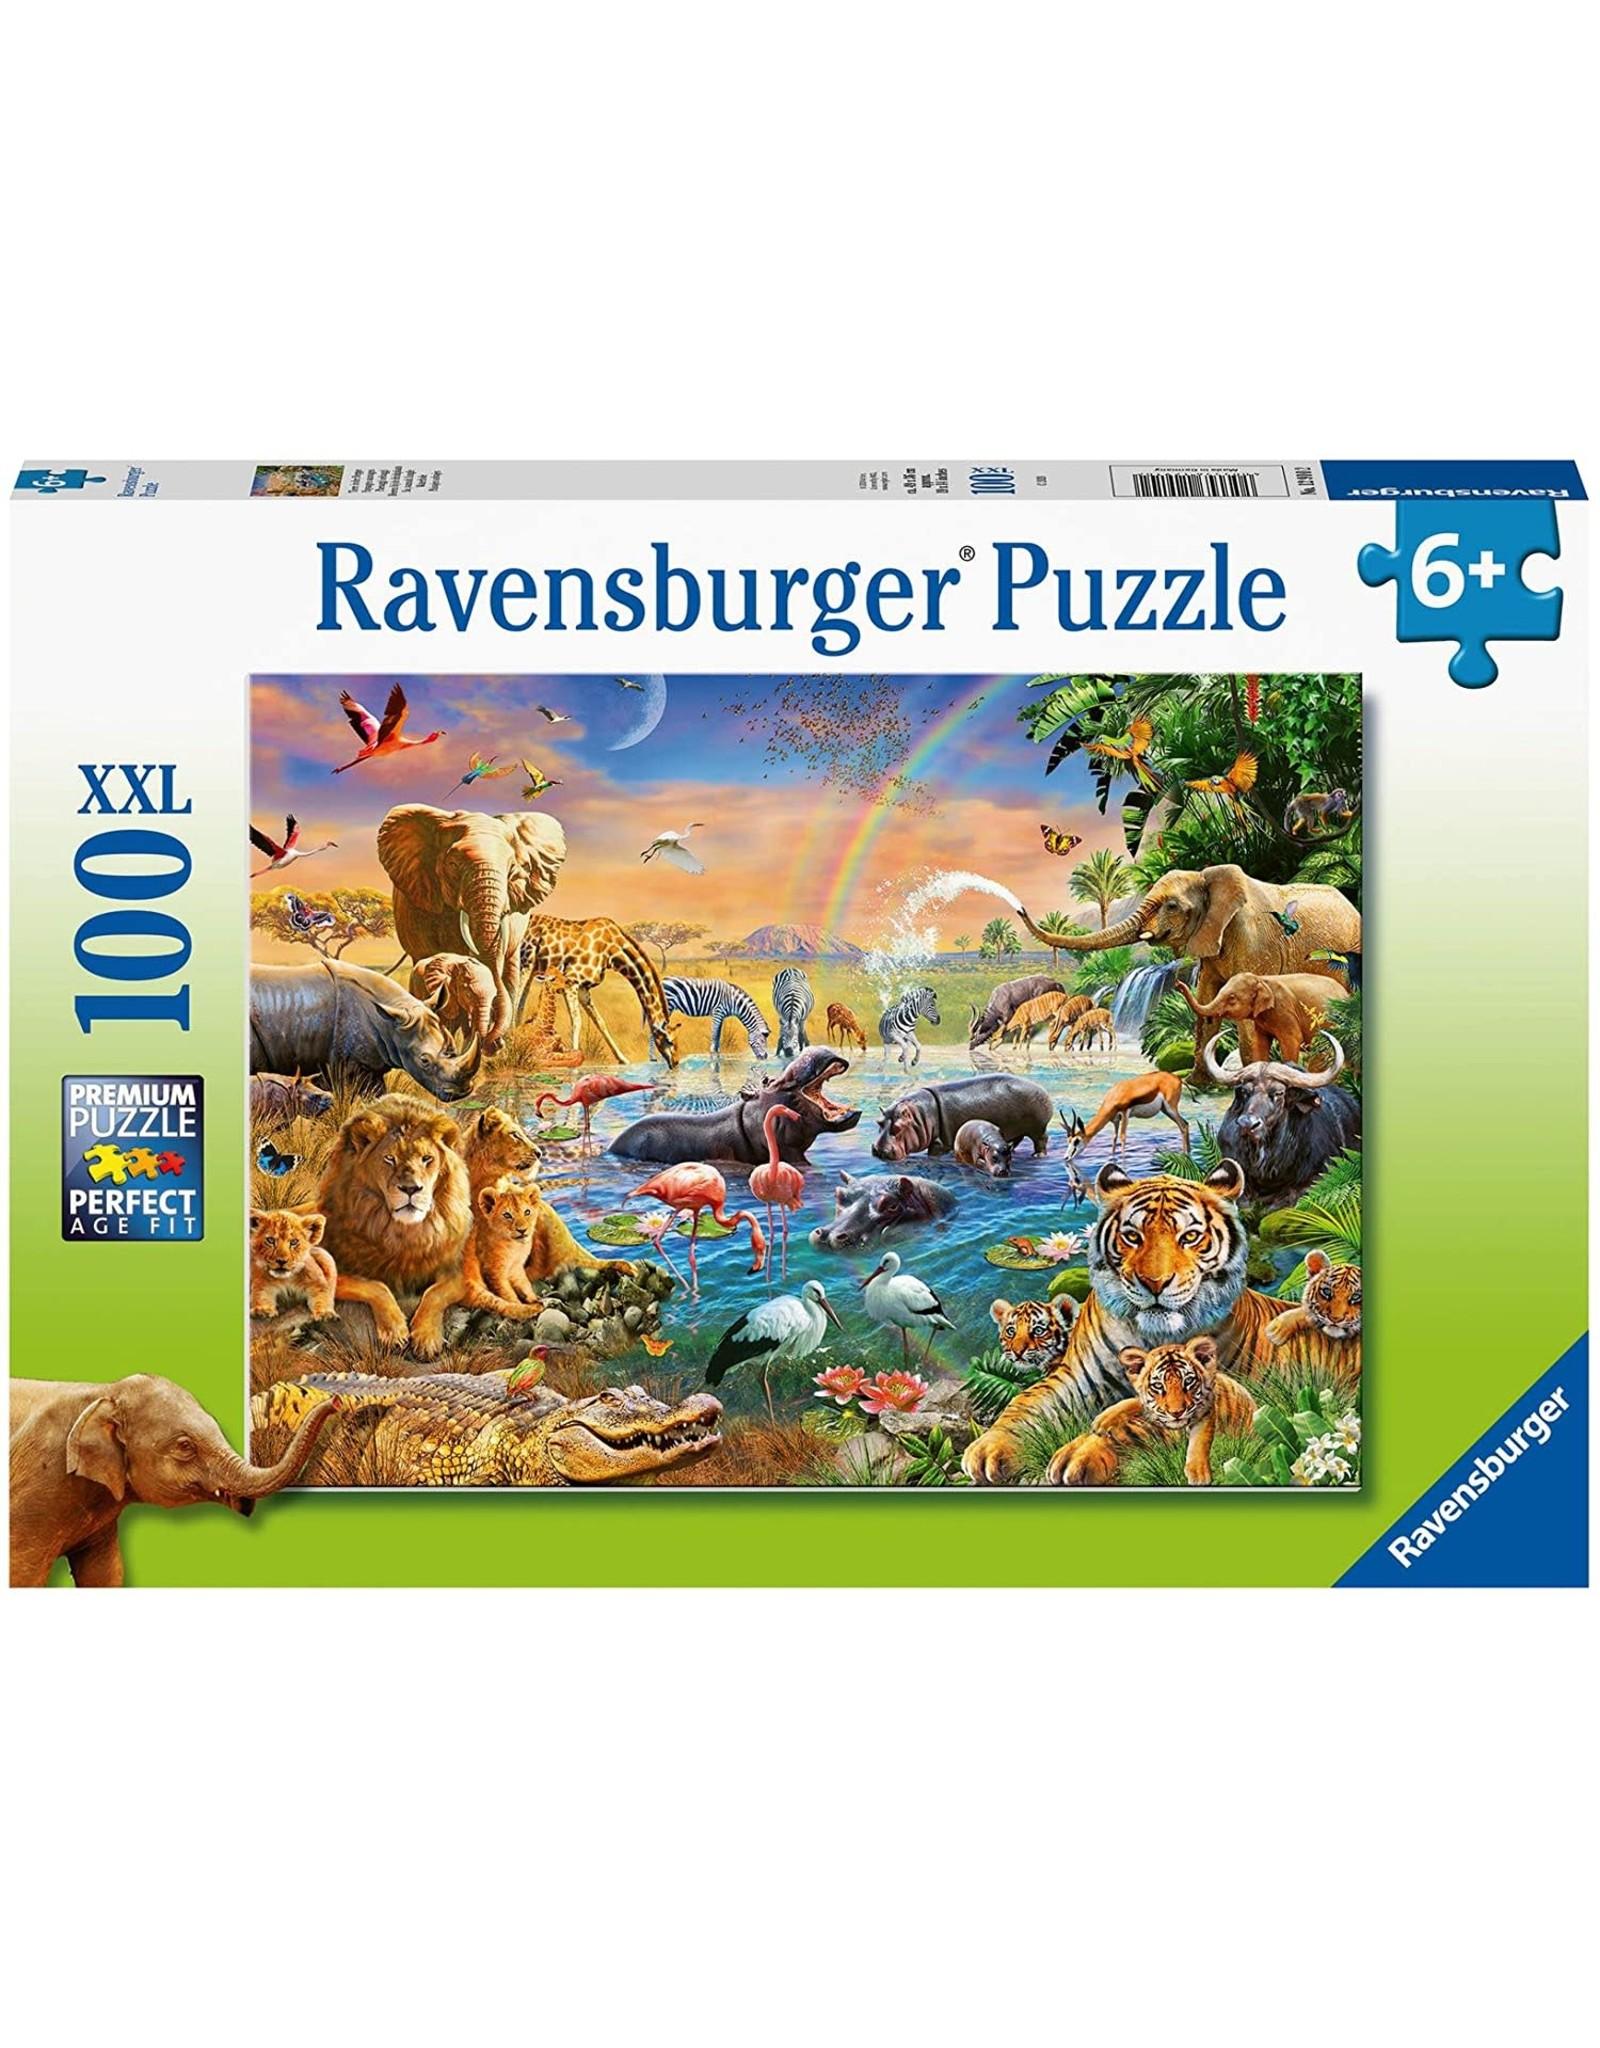 Ravensburger Savannah Jungle Waterhole 100 pc